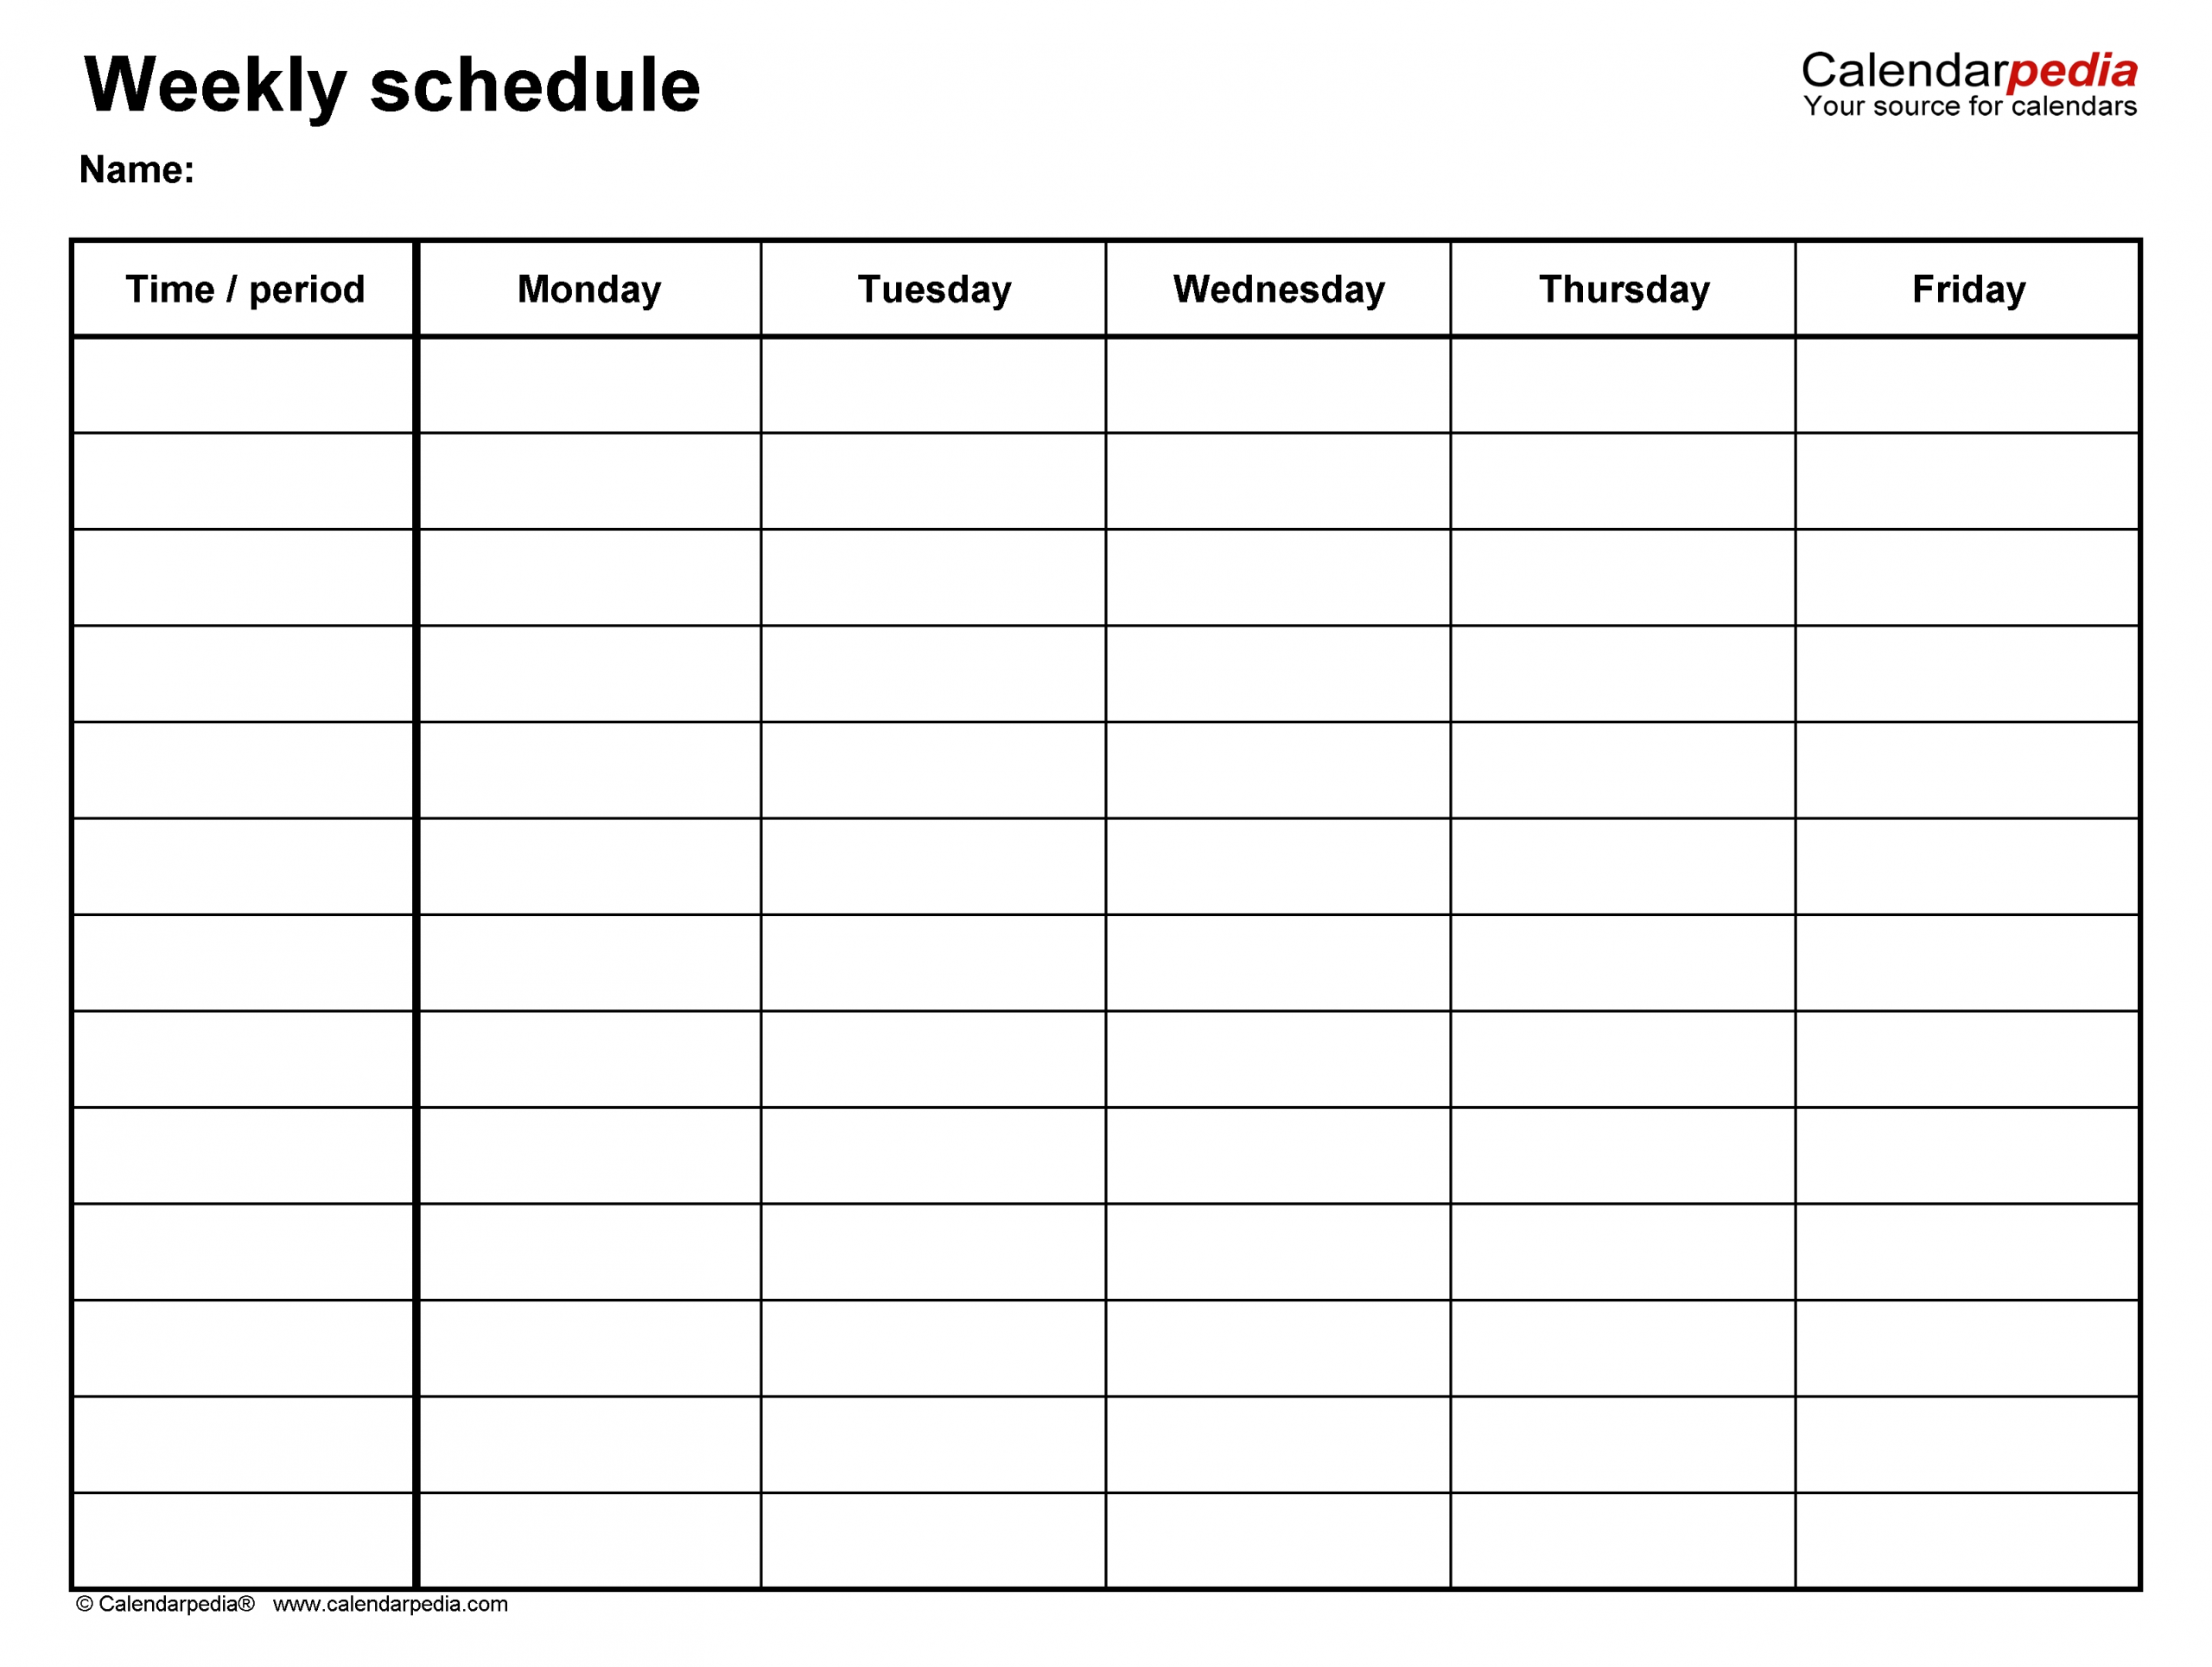 Pick 5 Day Calendar For Microsoft Word